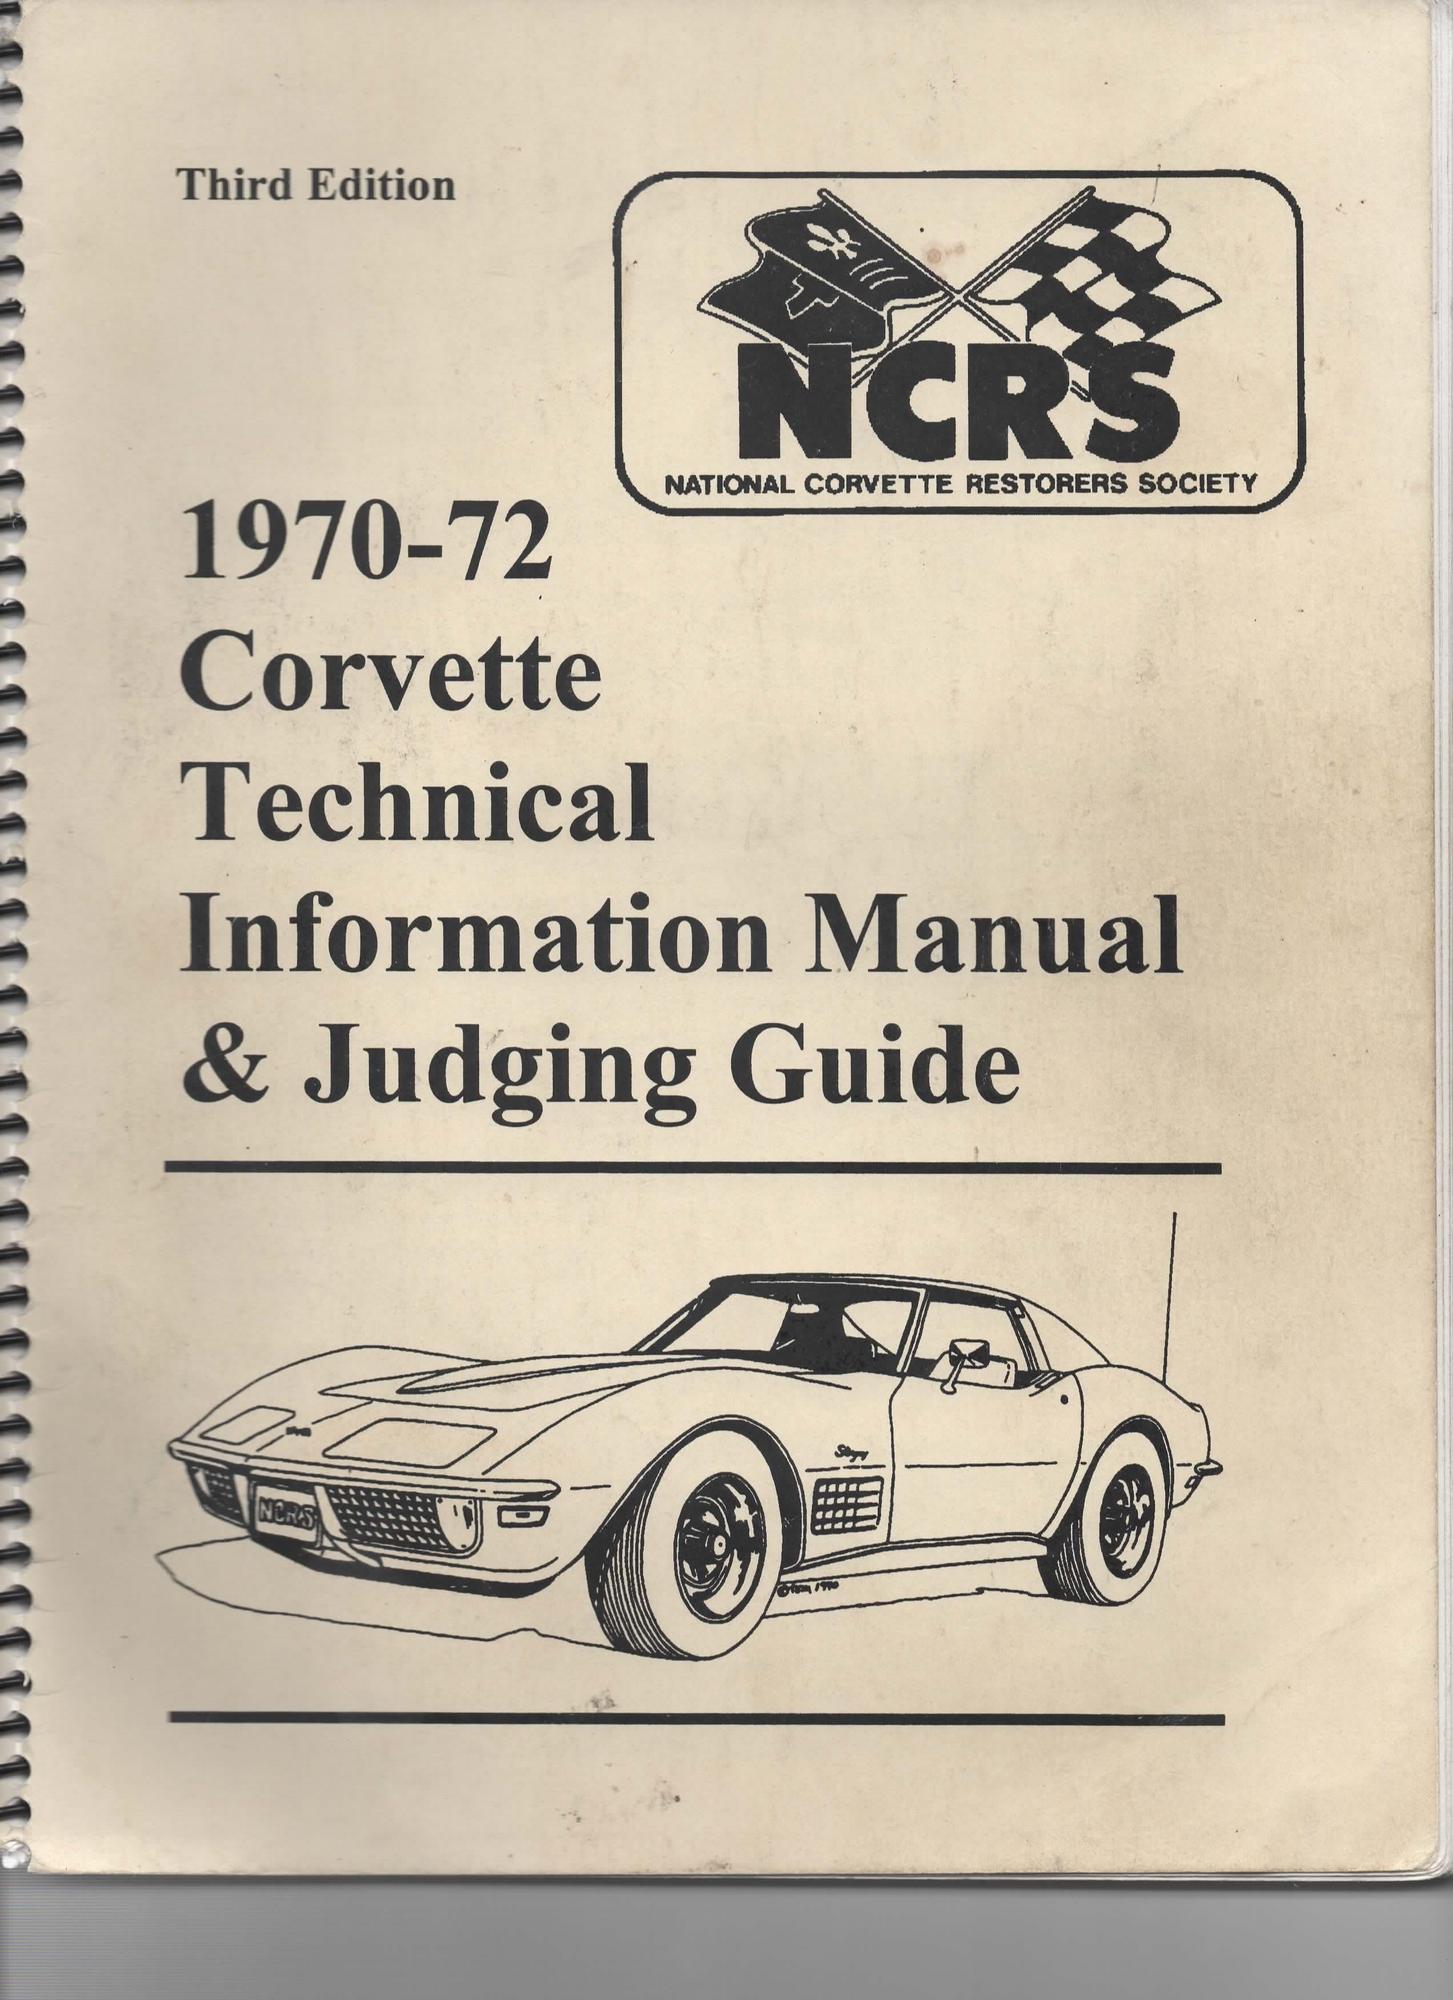 Maf Wire Diagram Corvetteforum Manual Guide